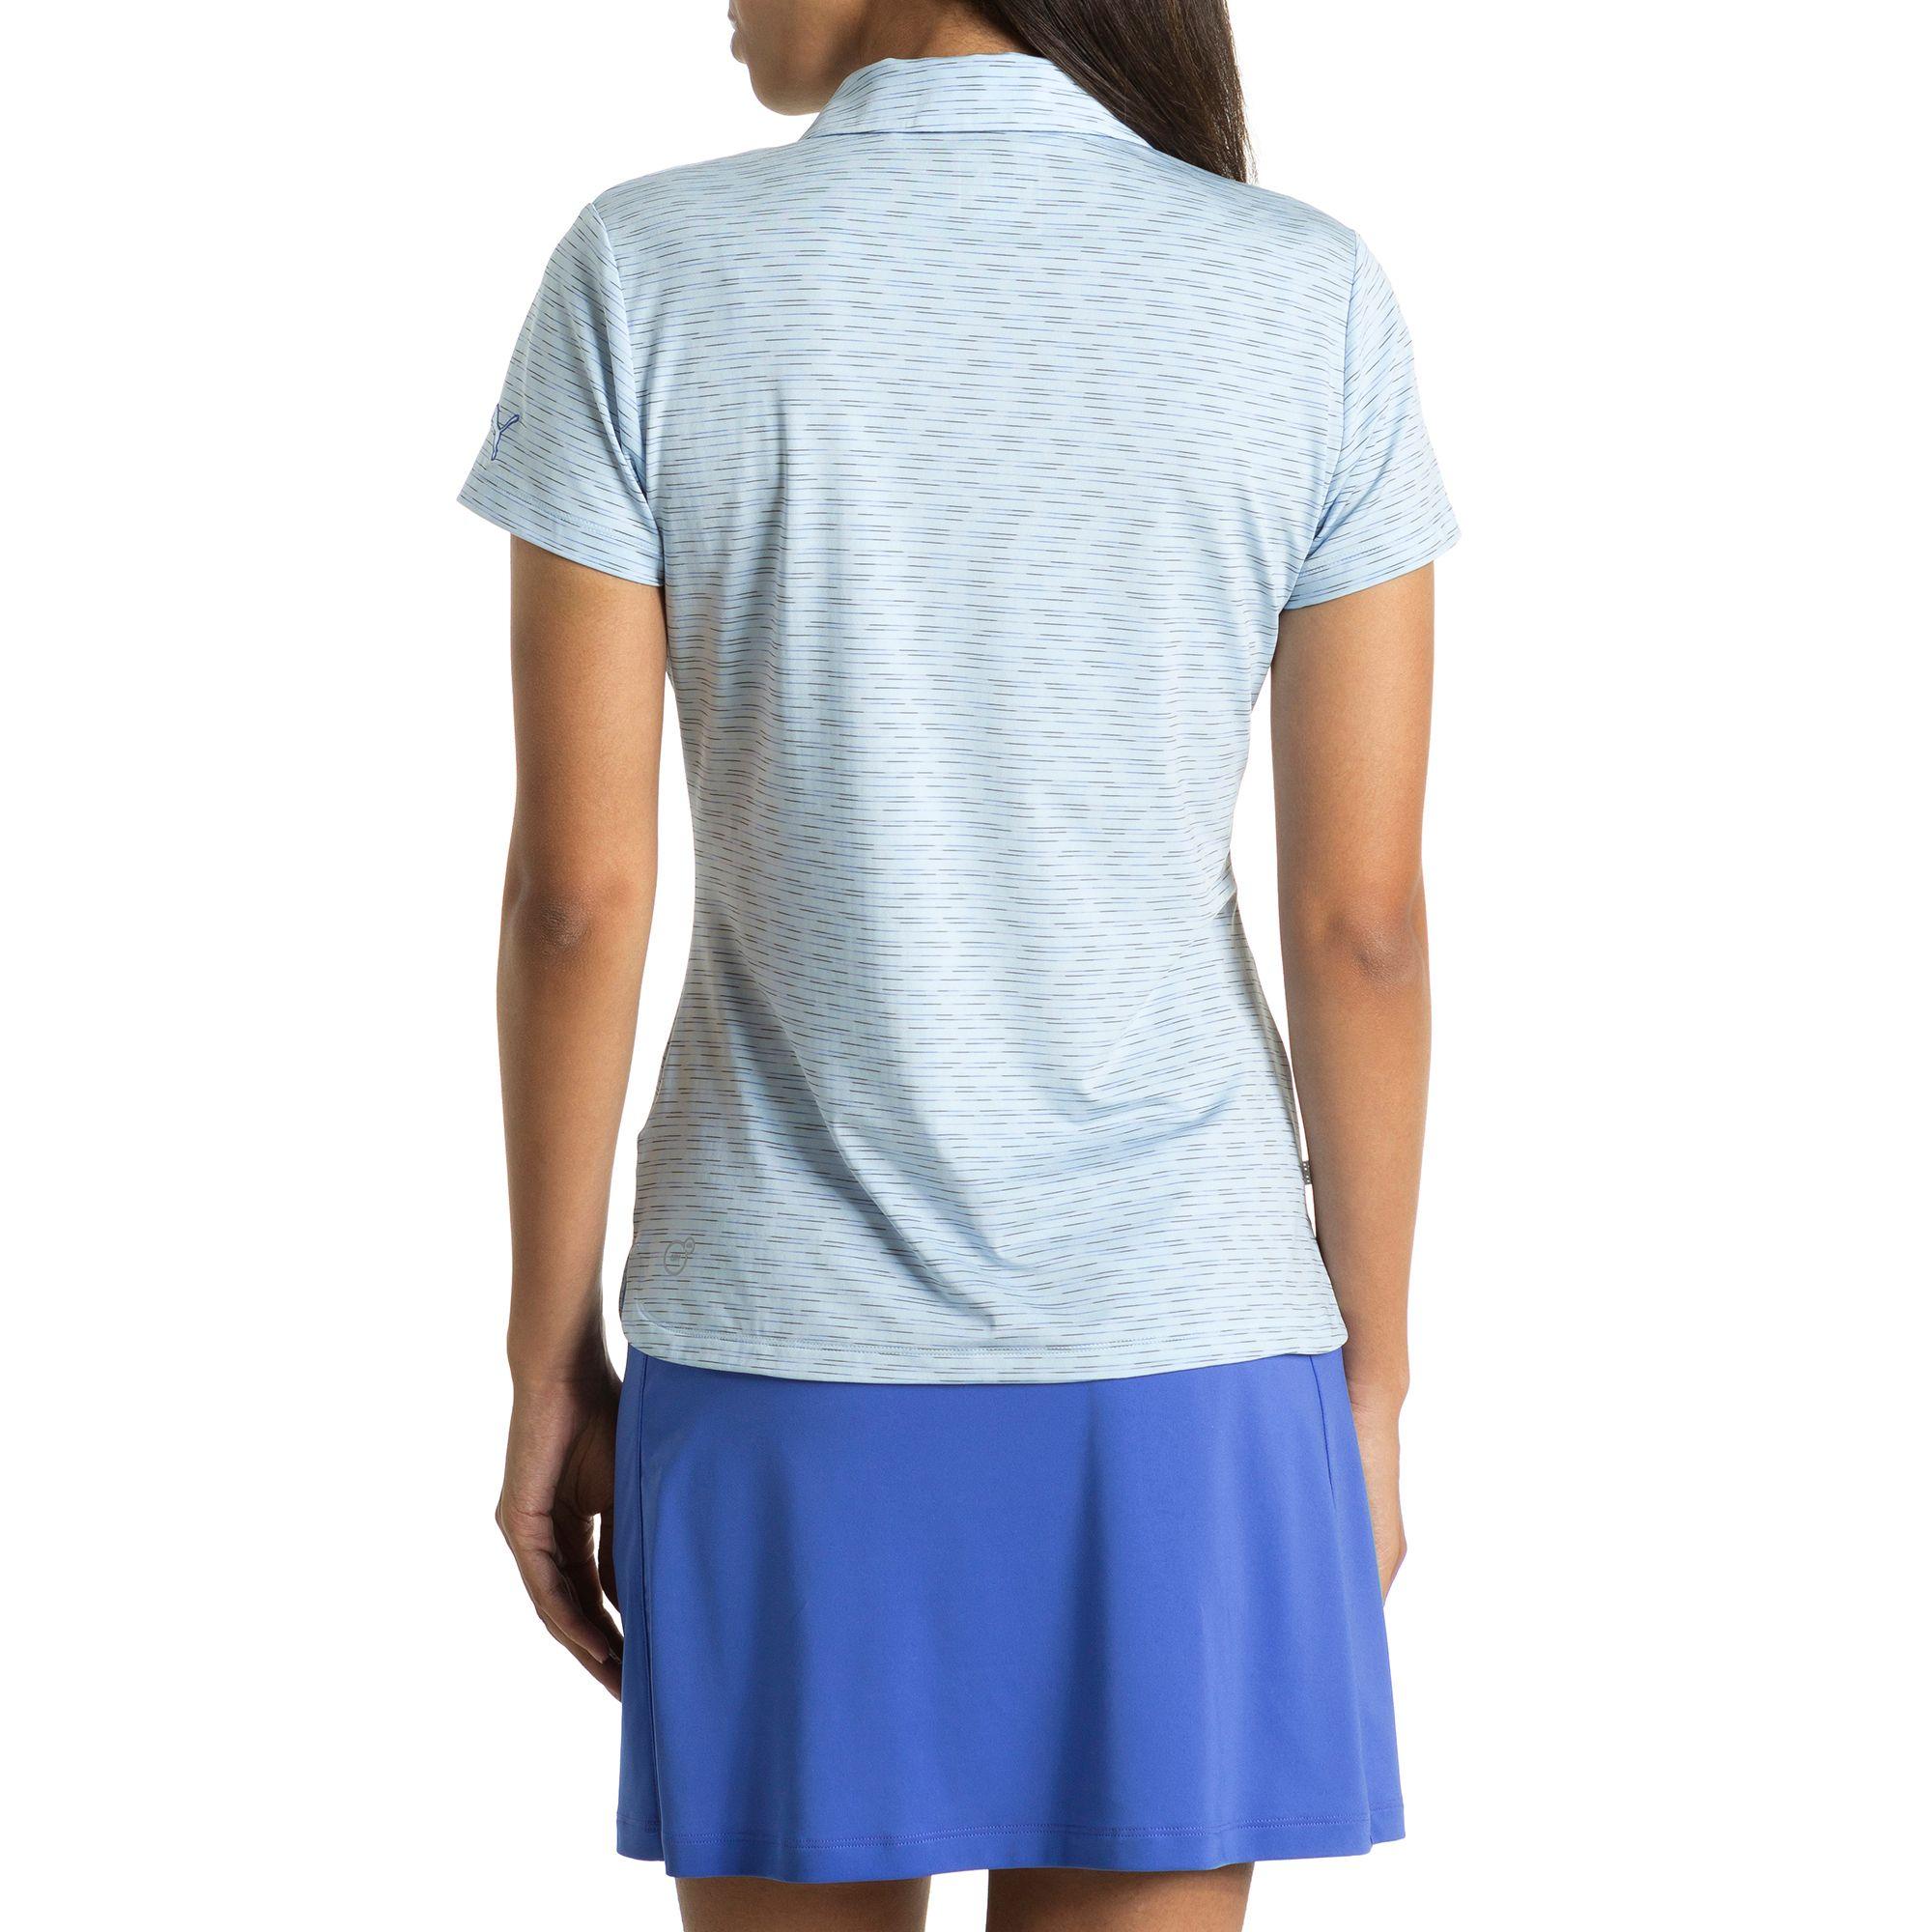 puma golf damen space dye pwrcool polo frauen polo shirt golf neu ebay. Black Bedroom Furniture Sets. Home Design Ideas